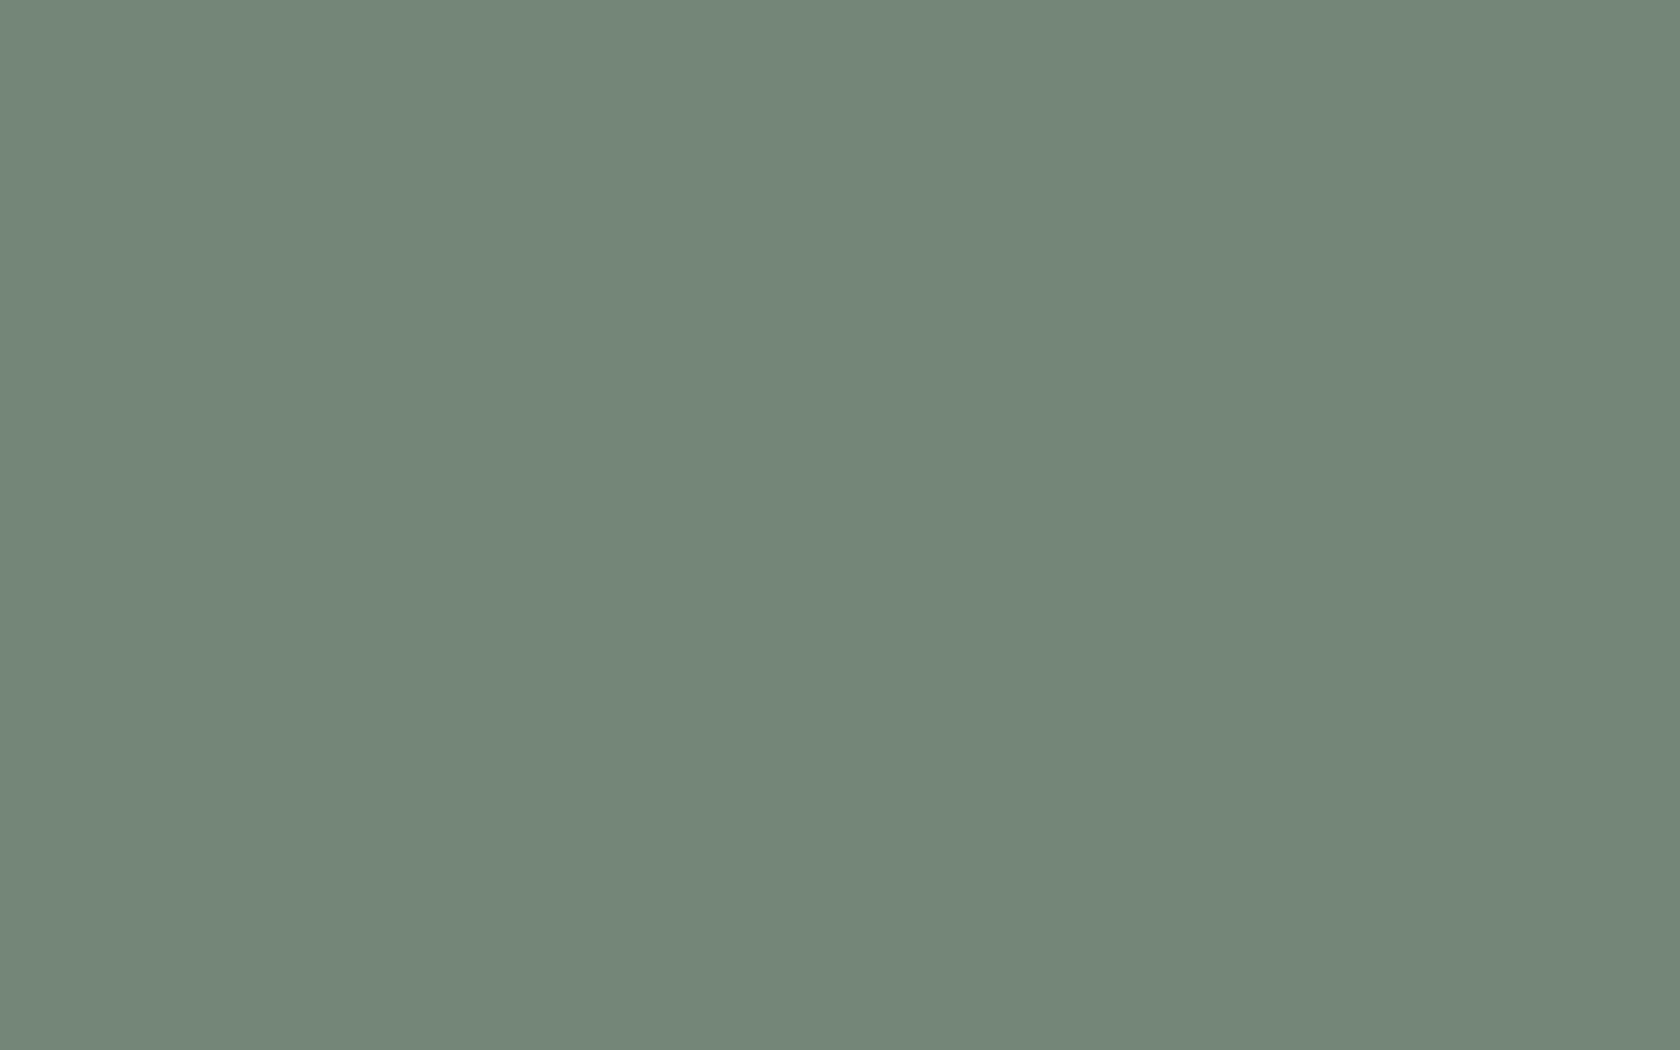 1680x1050 Xanadu Solid Color Background